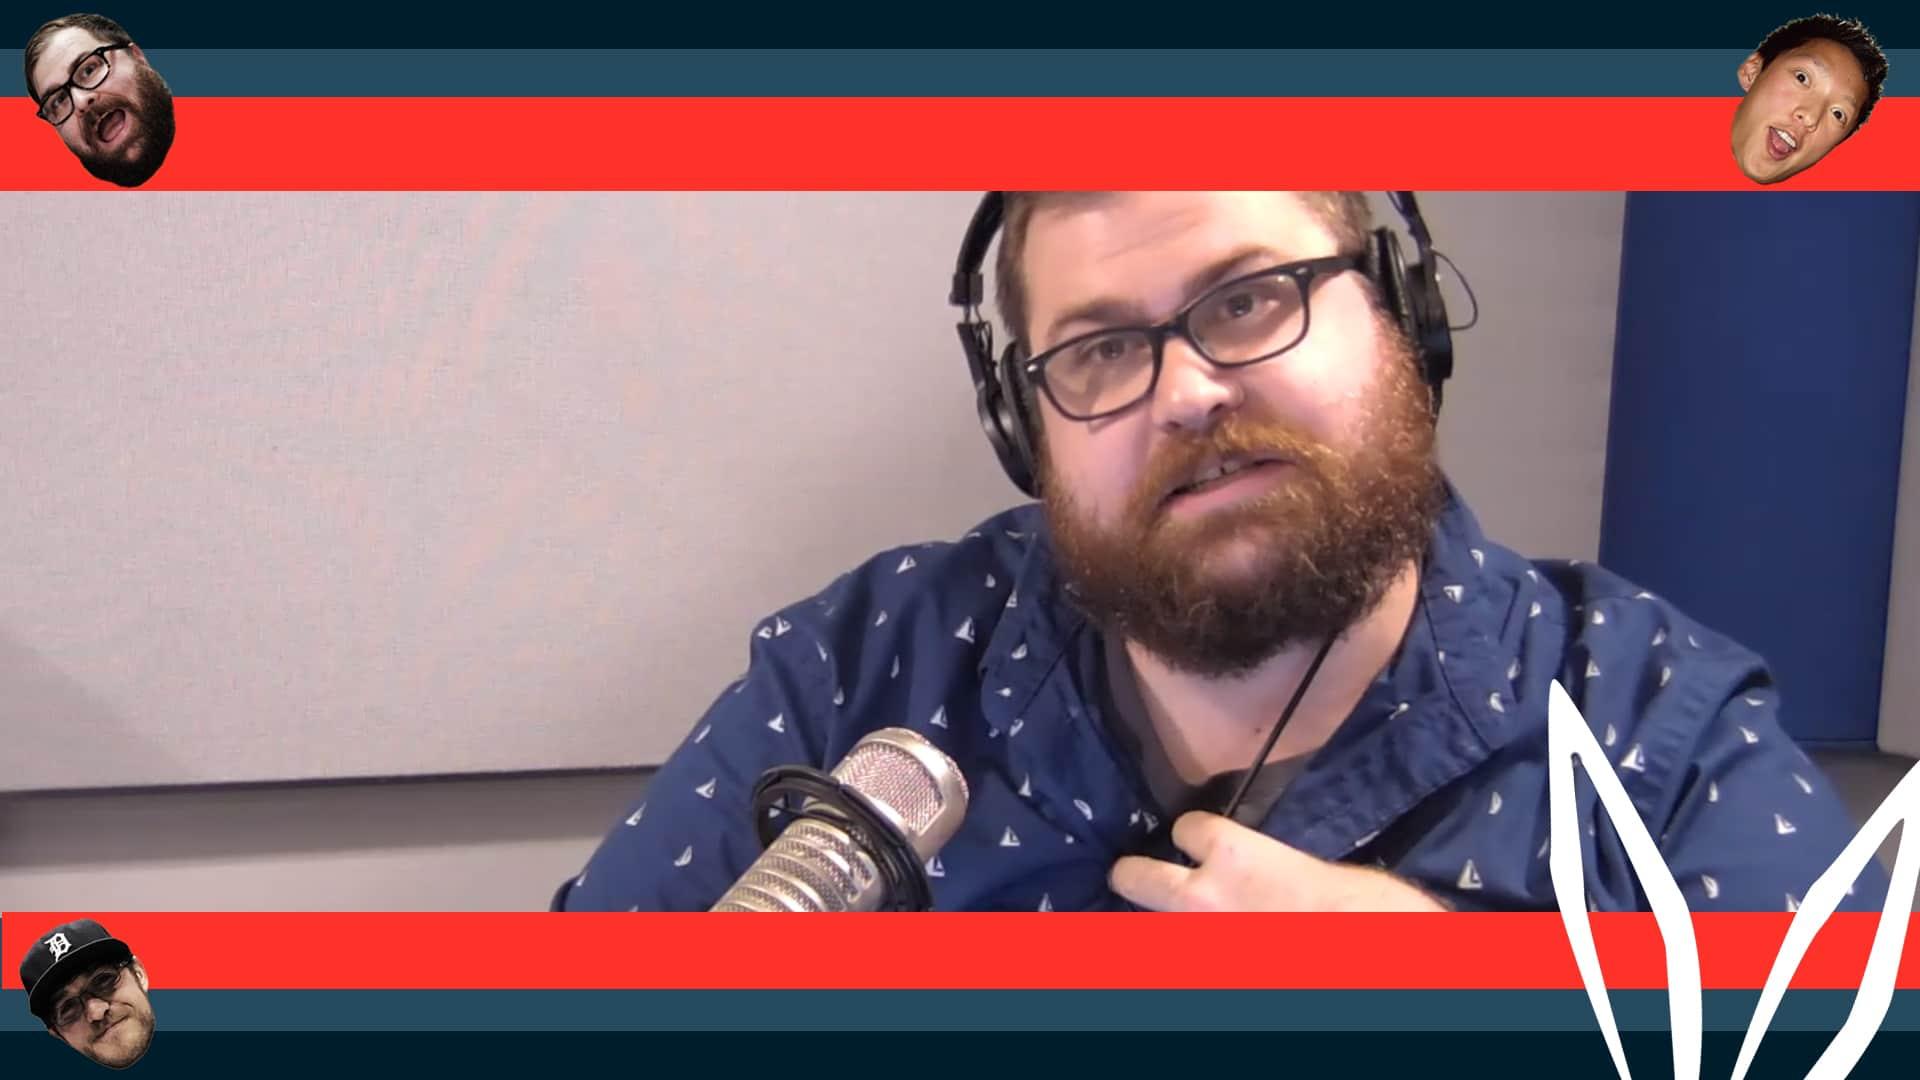 Geektainment Weekly - Episode 47